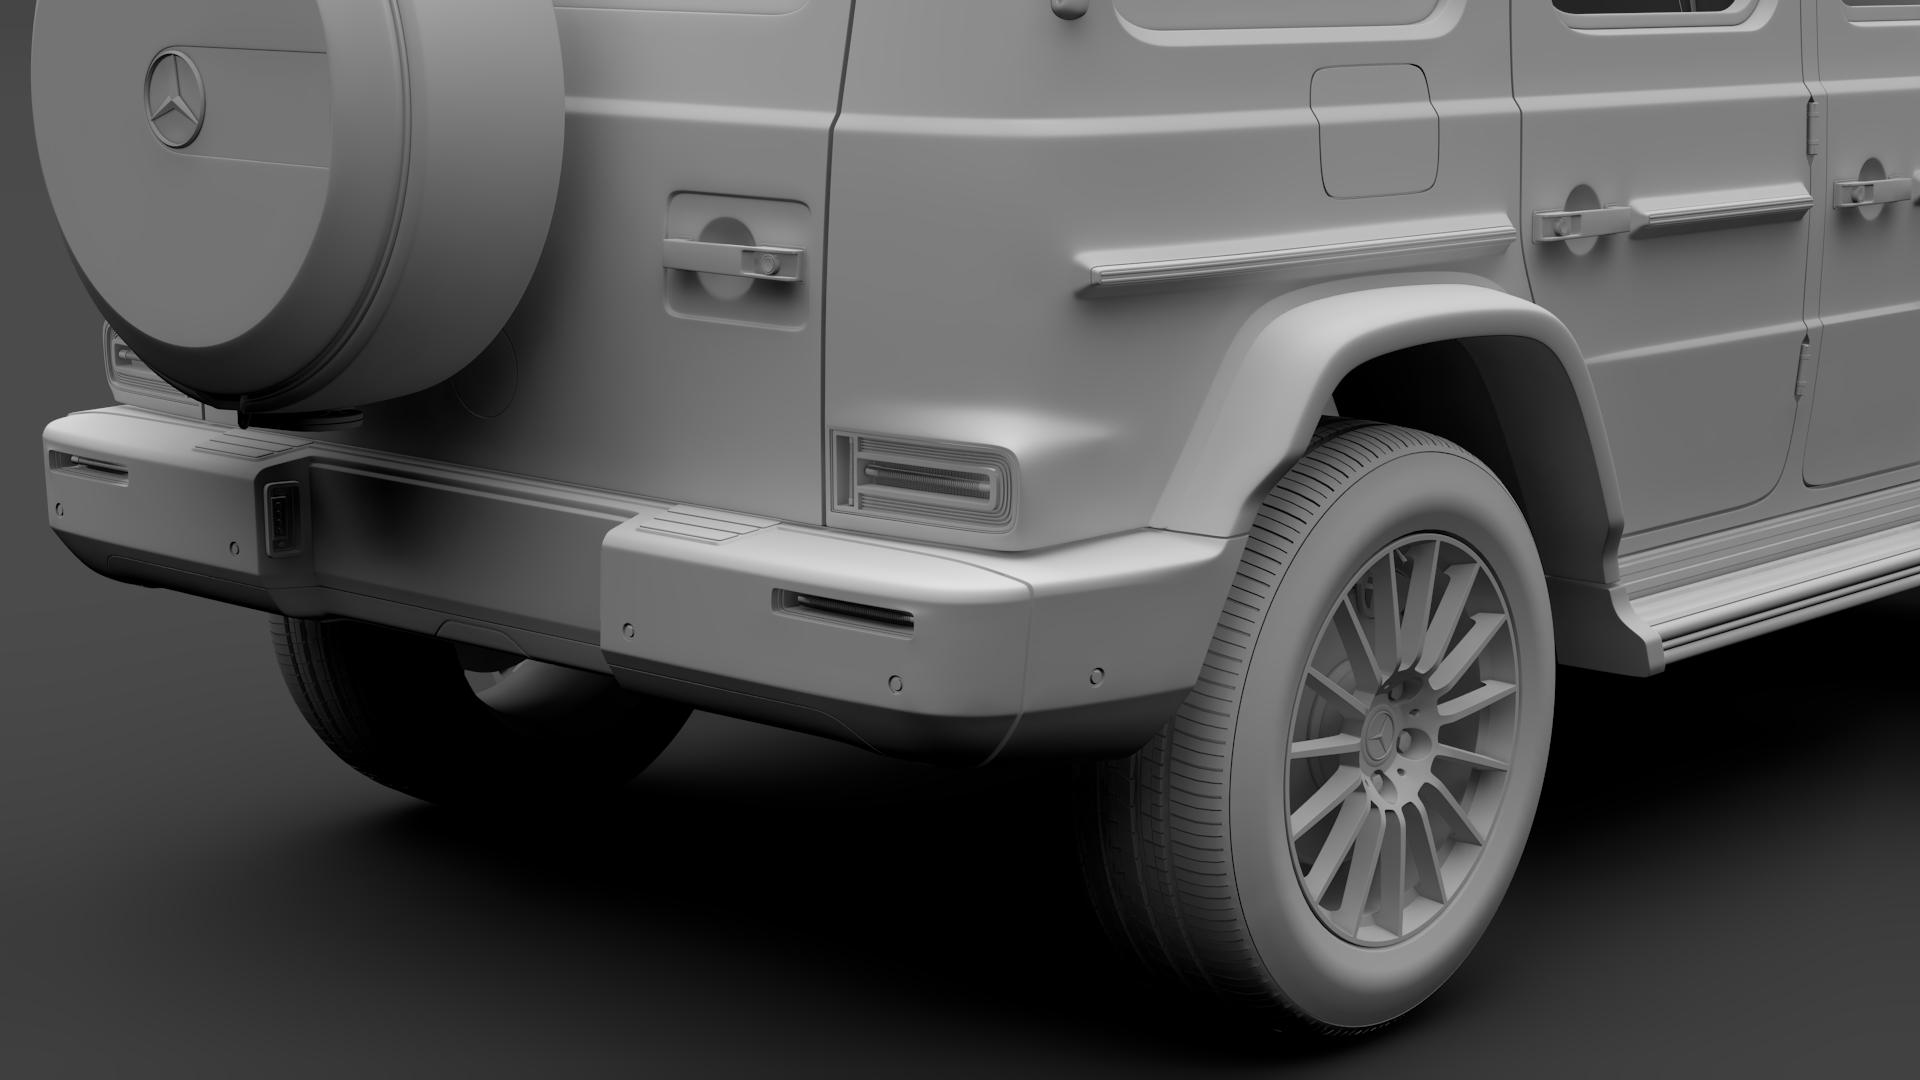 mercedes-benz g 550 (w464) 2018 3d model max fbx c4d lwo ma mb hrc xsi obj 277671